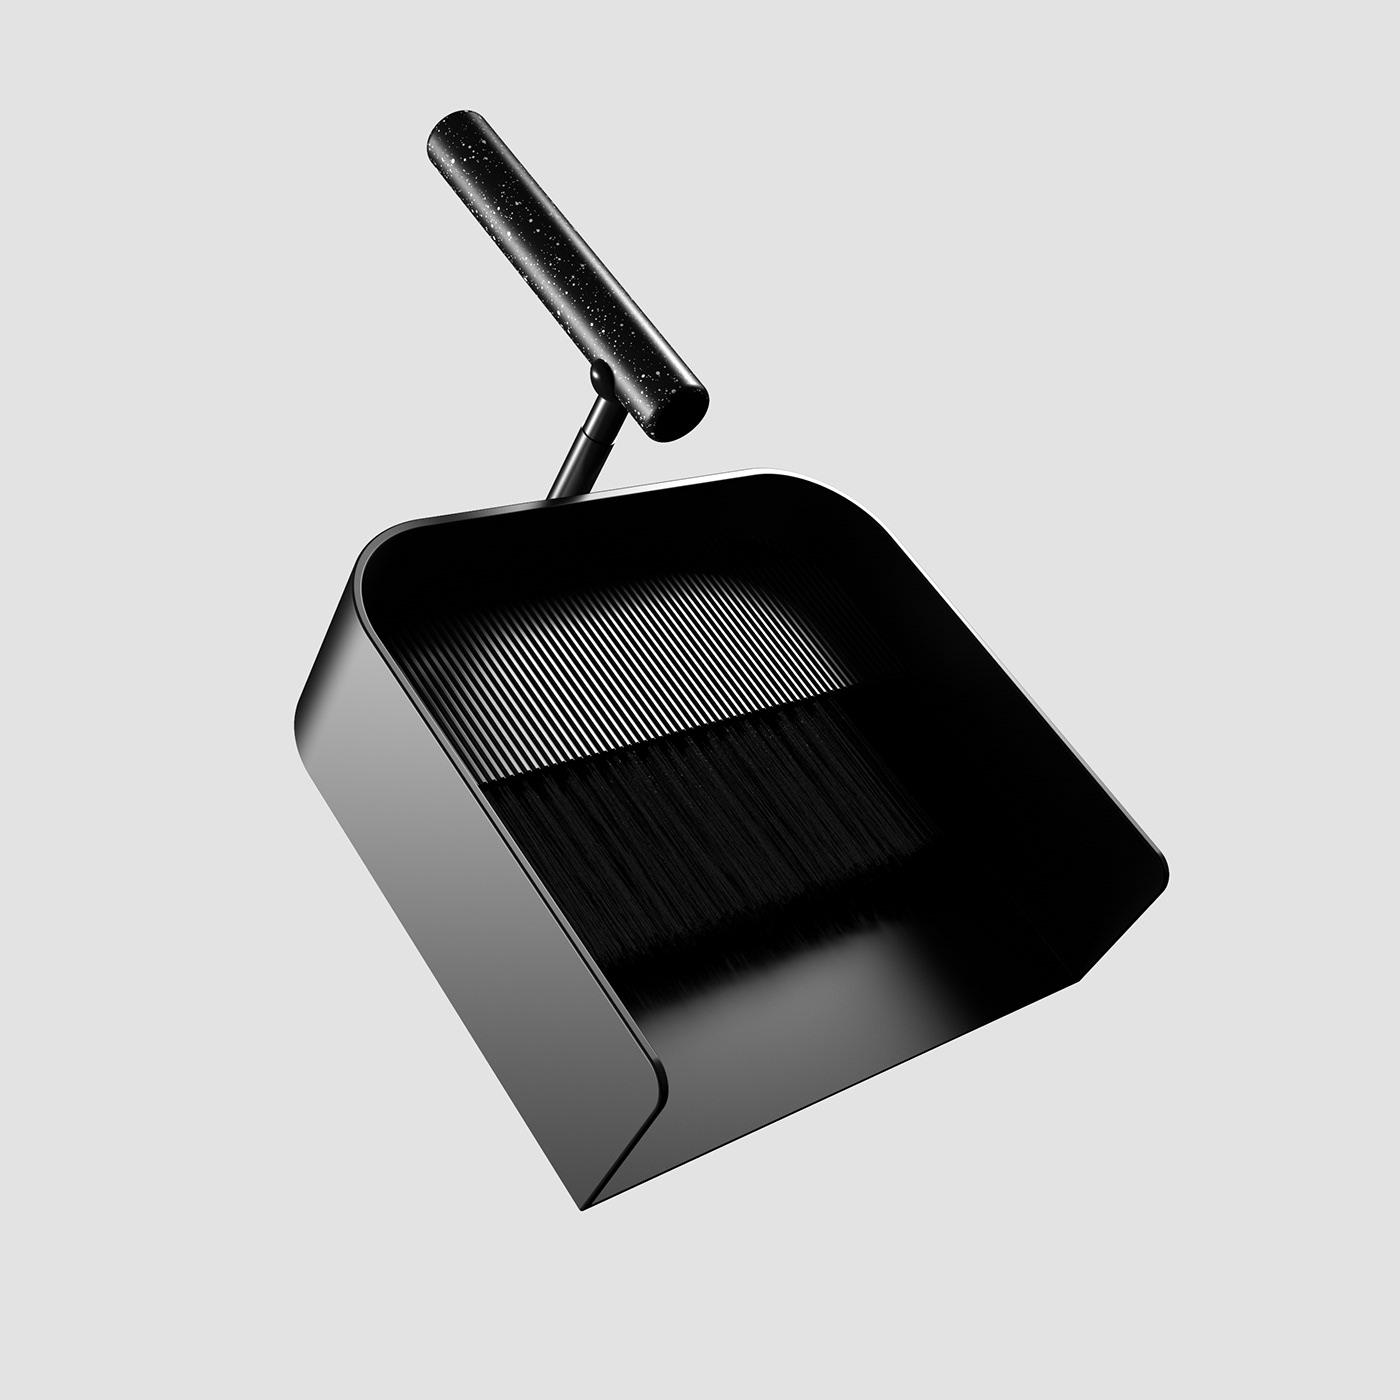 art design industrial design  industrial designer product design  product designer UI/UX